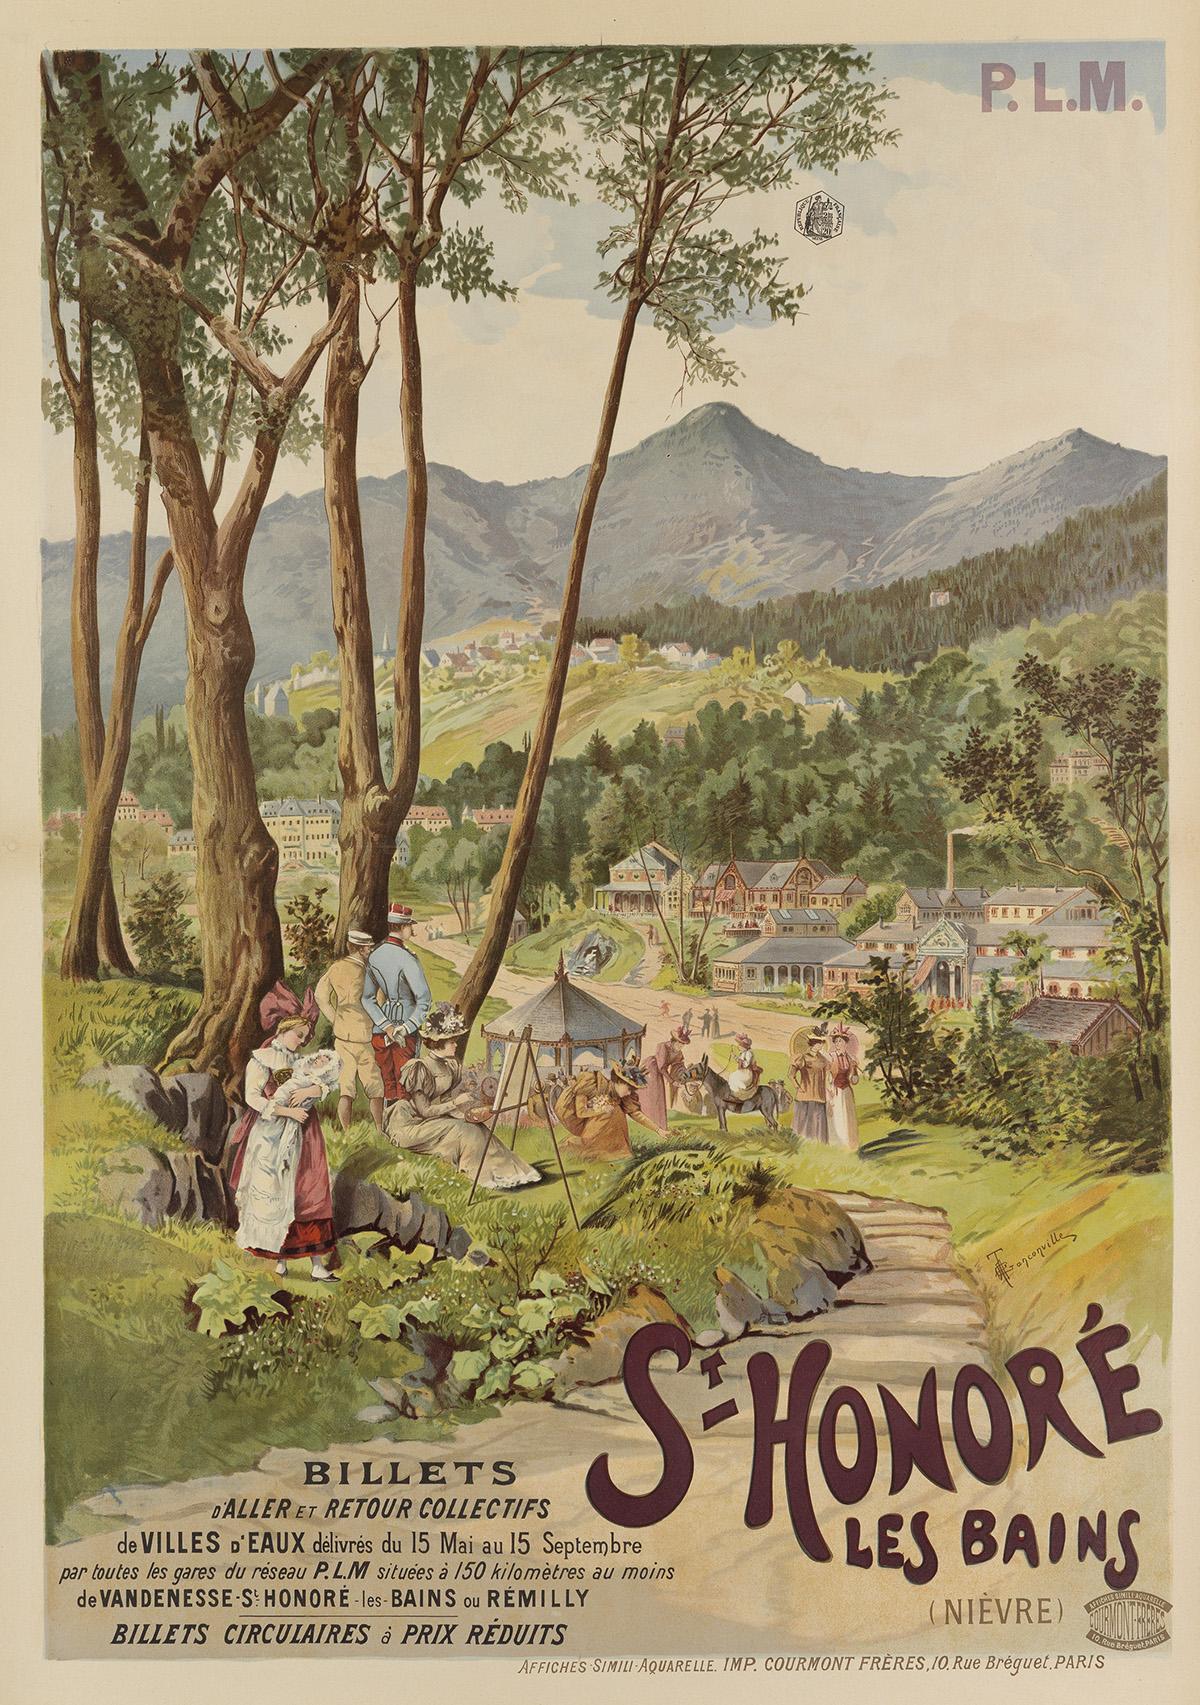 HENRI-GANIER-TANCONVILLE-(1845-1936)-ST-HONORÉ-LES-BAINS-Cir